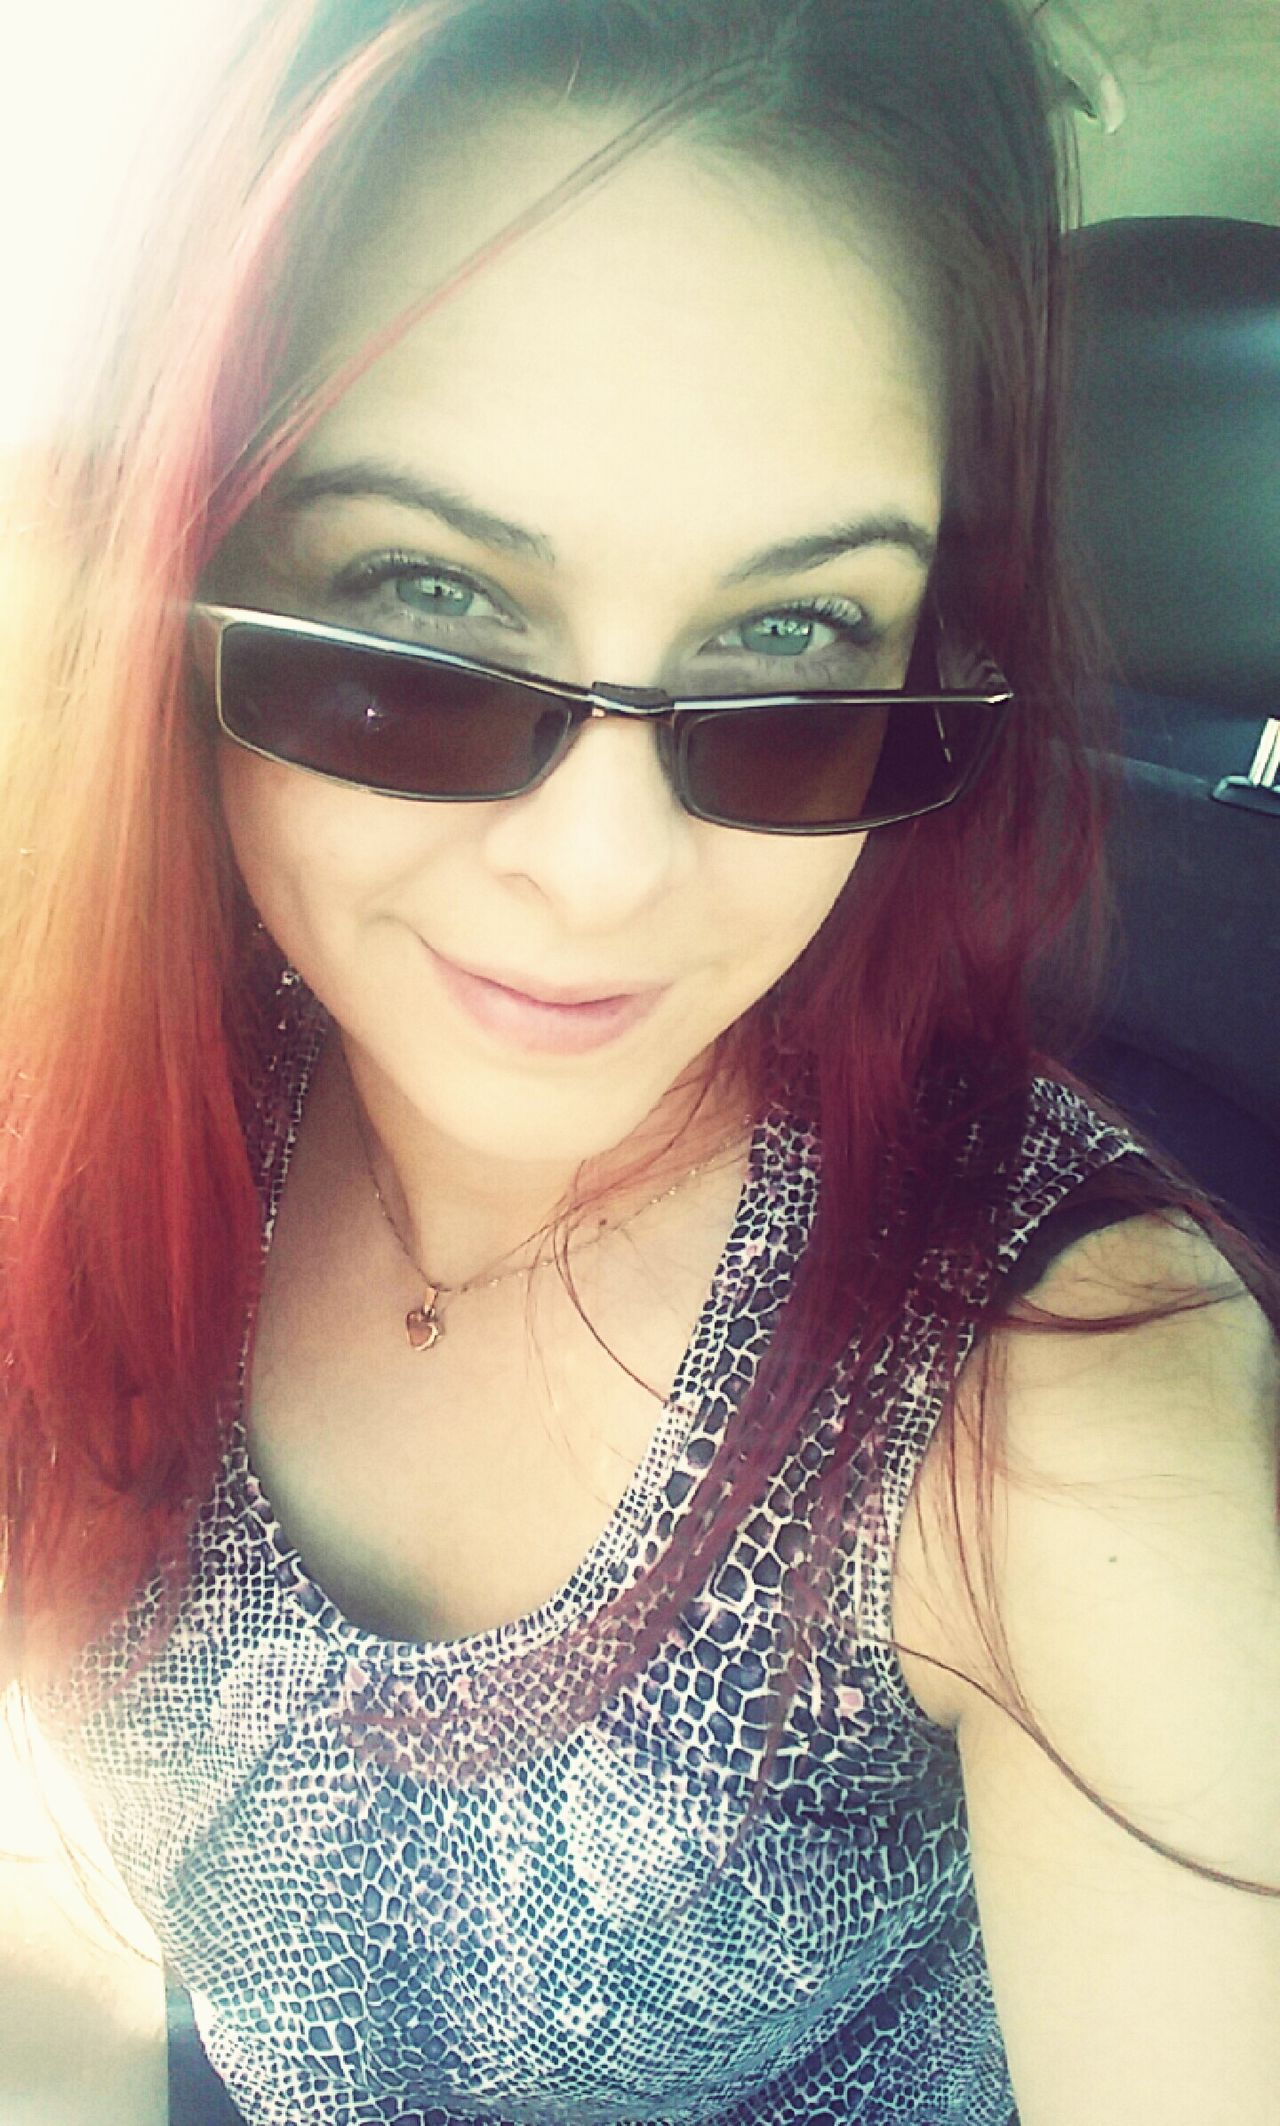 Headshot Young Women Long Hair Red Hair Sunglasses ✌👌 BlueEyes Selfie ✌